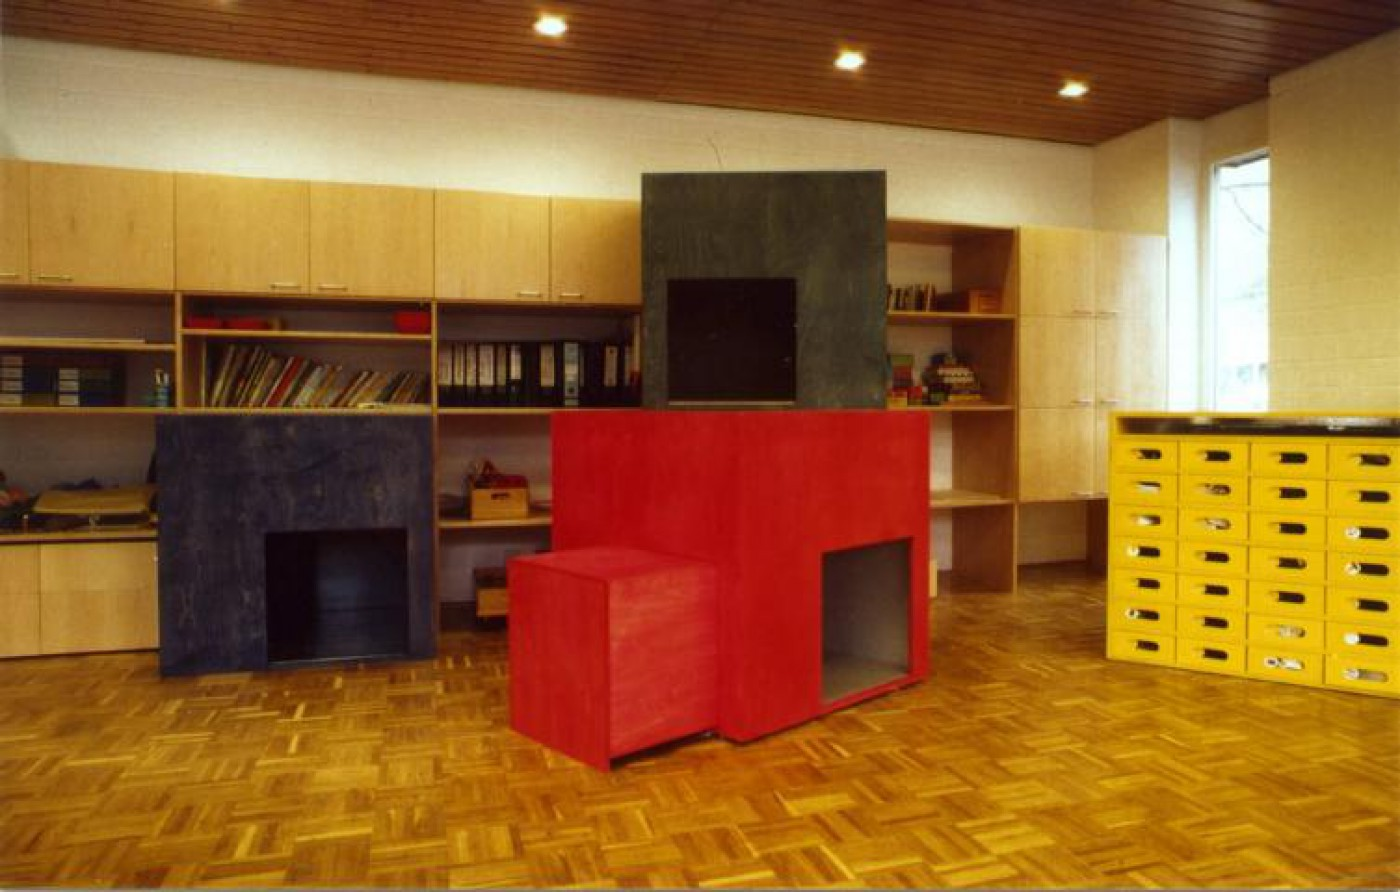 ww_Bildung_Kindergarten_St Albertus Magnus_ Copyright_Axel_Paulus_Zuerich_4c_1400x0_3